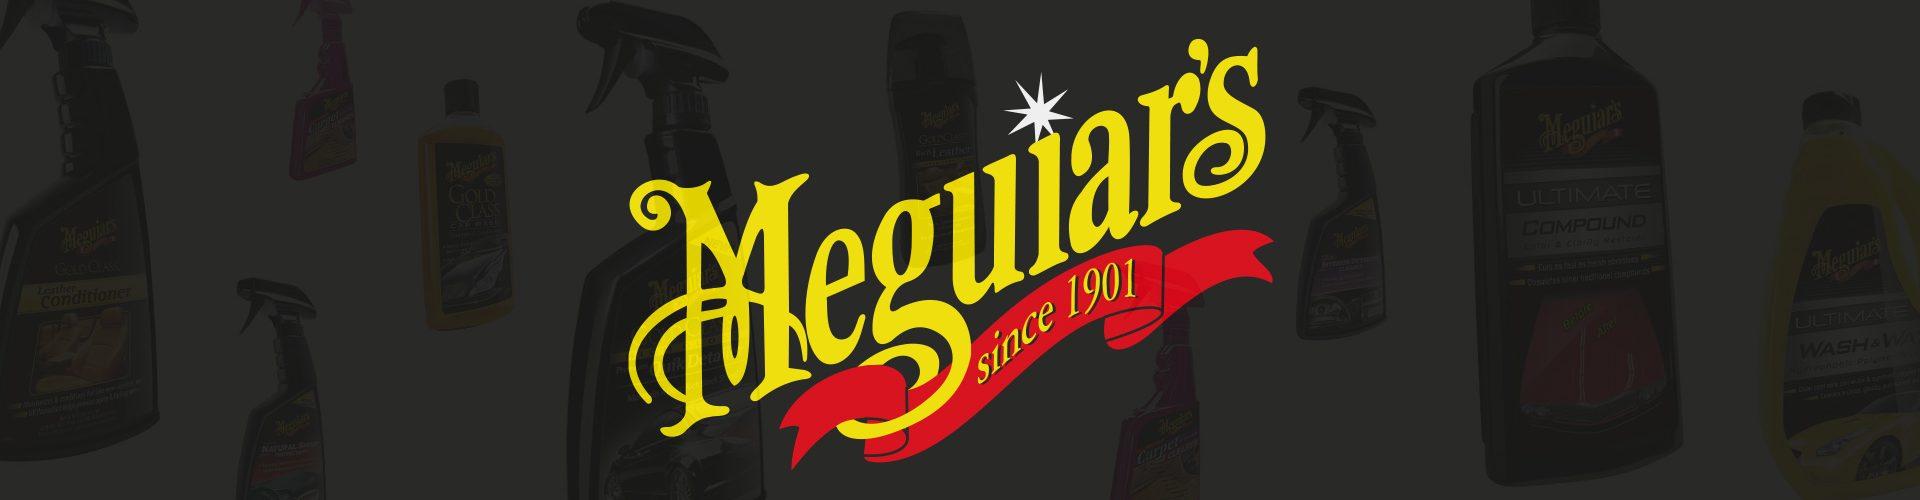 Produits Meguiar's